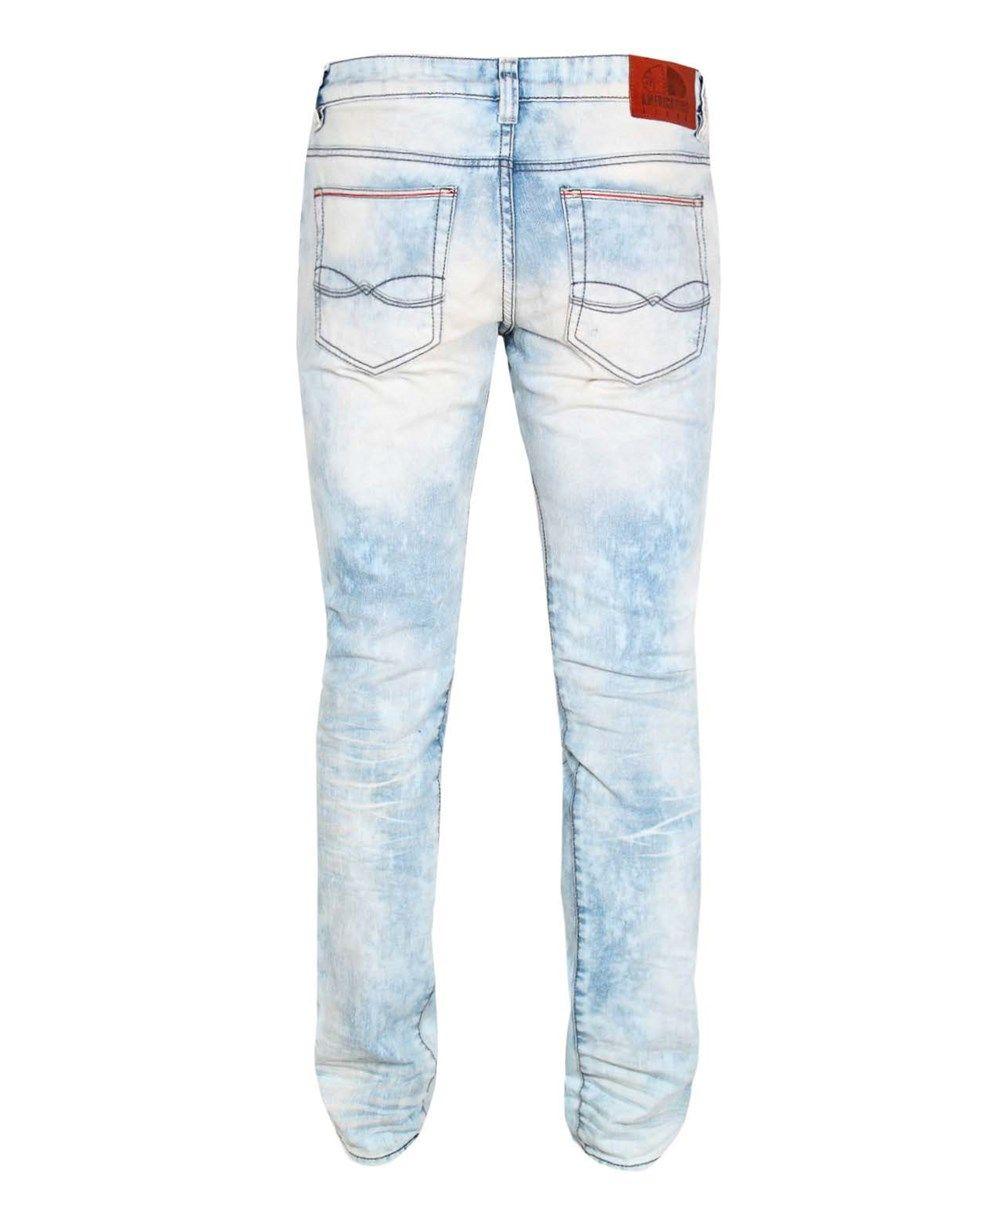 6dabce17 Jean Hombre AMERICANINO 5334701 - americanino | Outfit Maru | Jeans ...